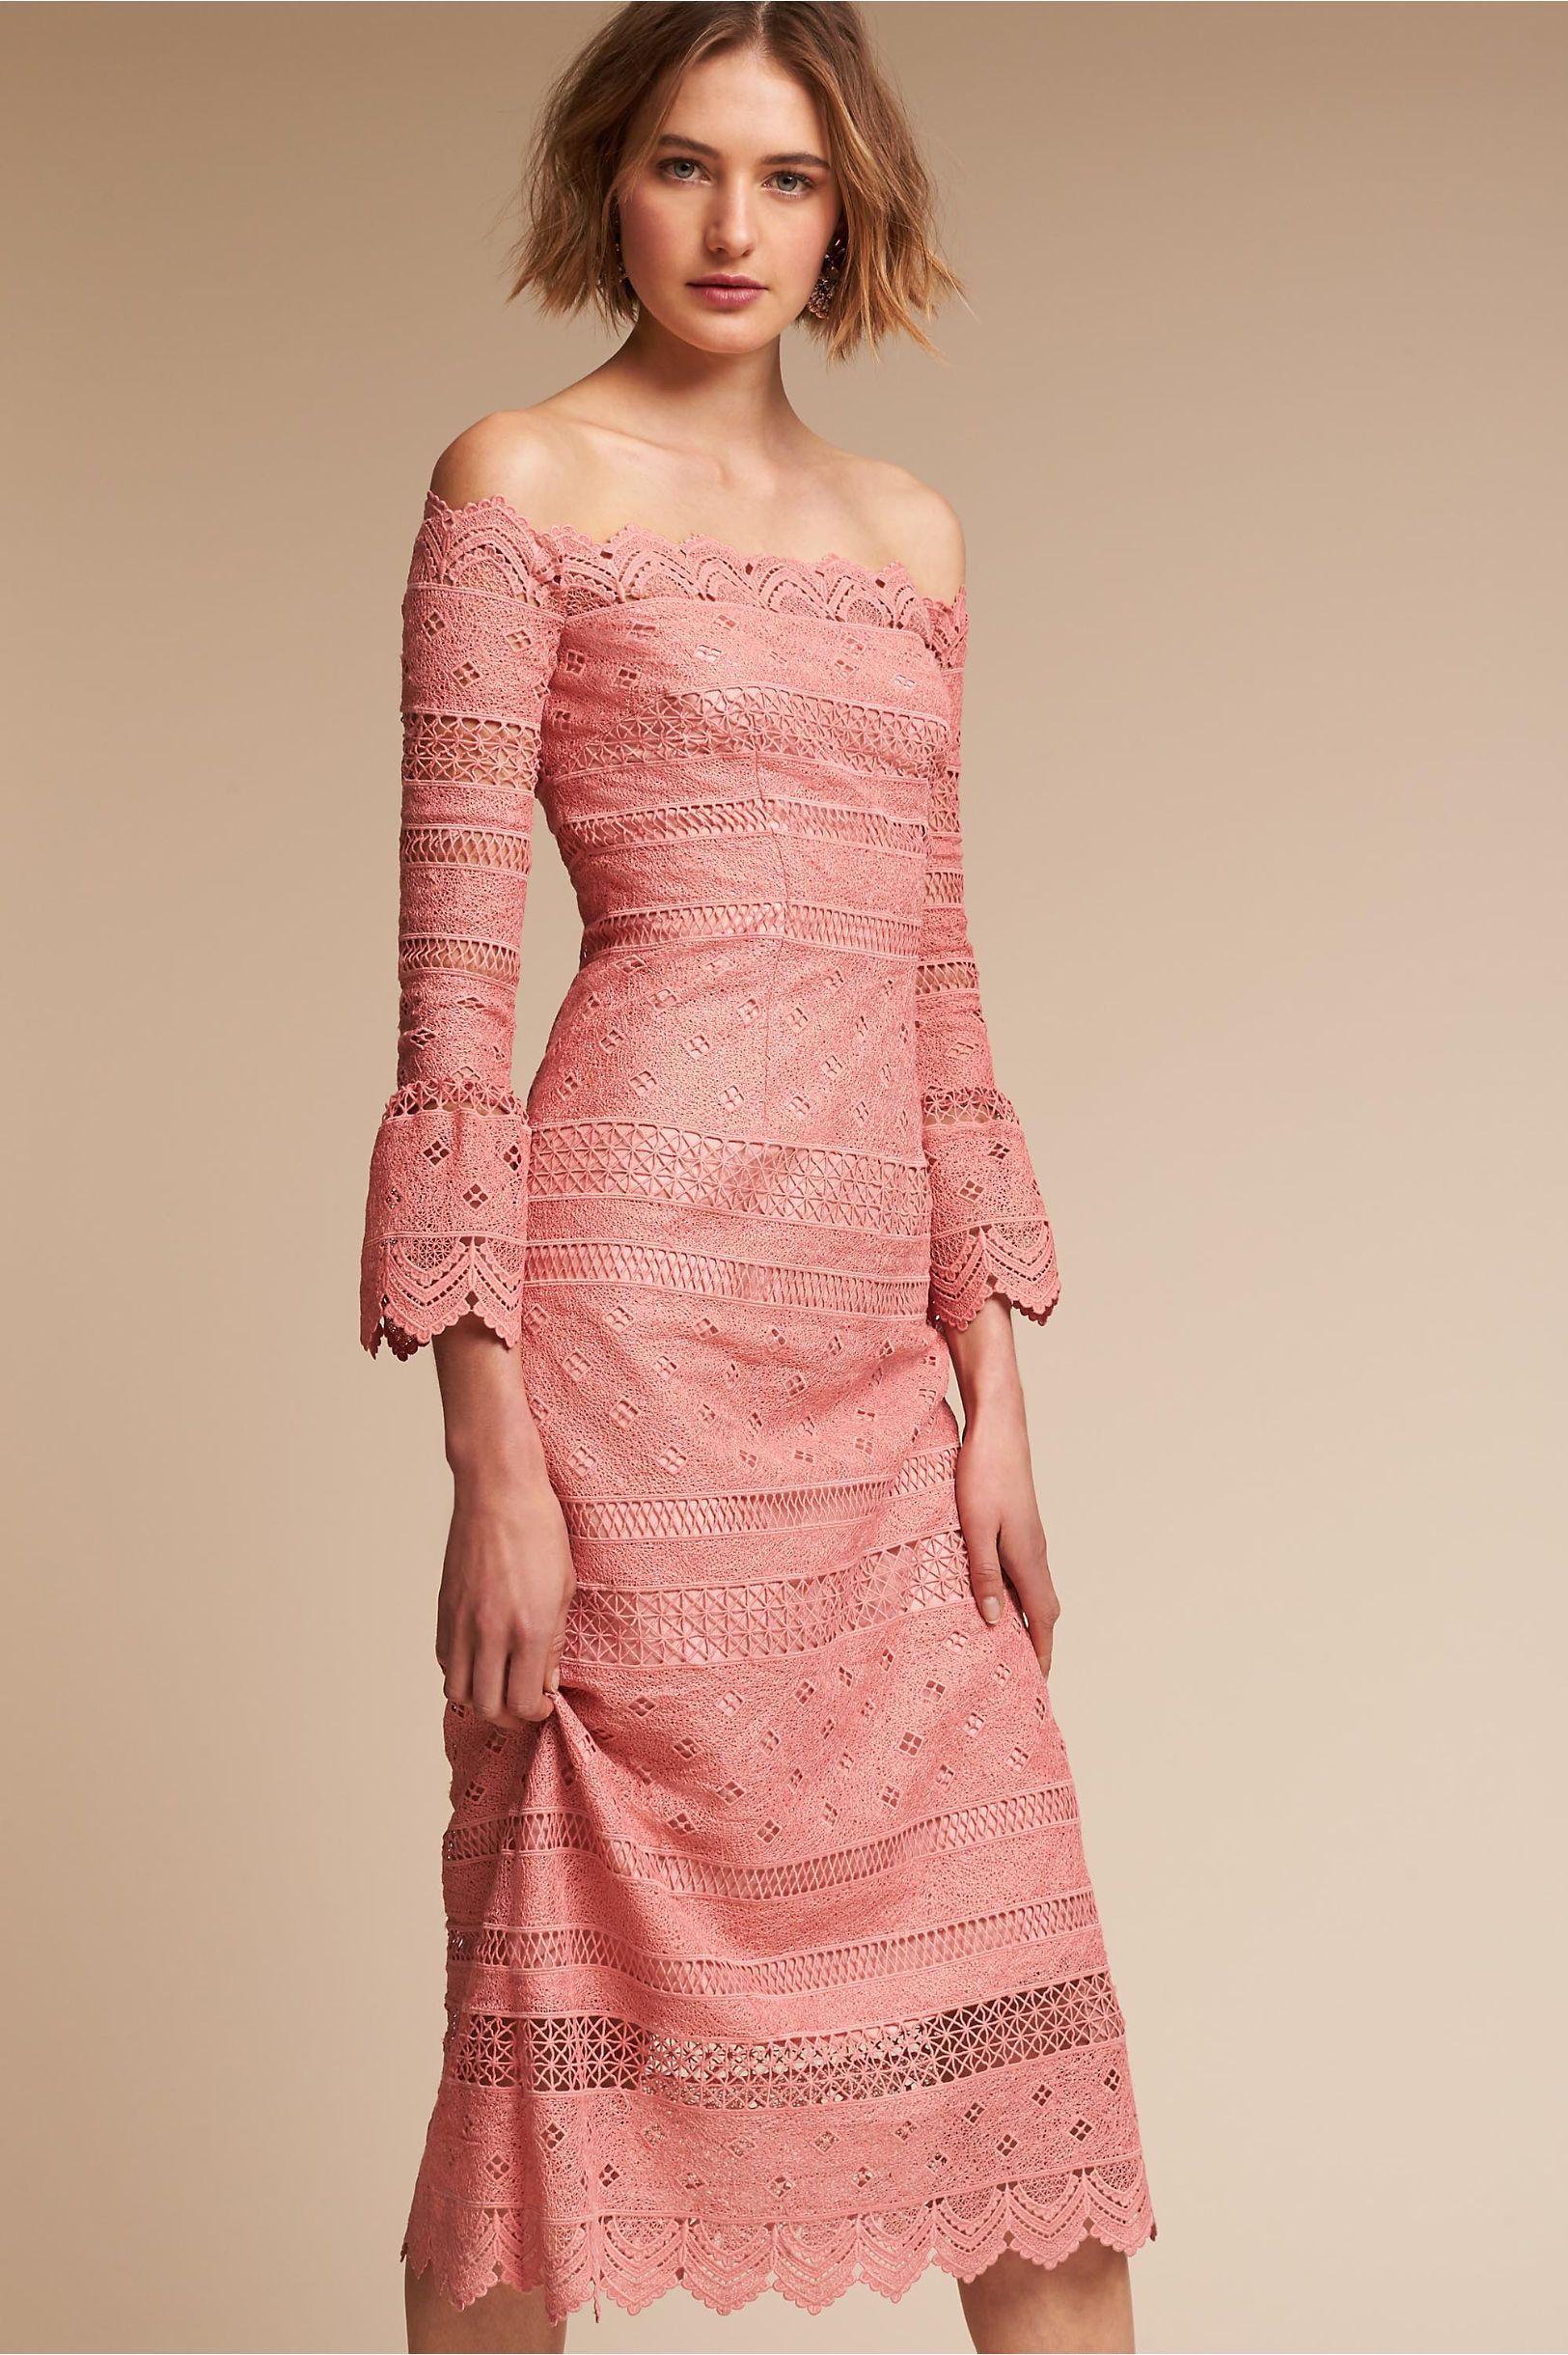 BHLDN\'s Amur Abriana Dress in Rose Pink